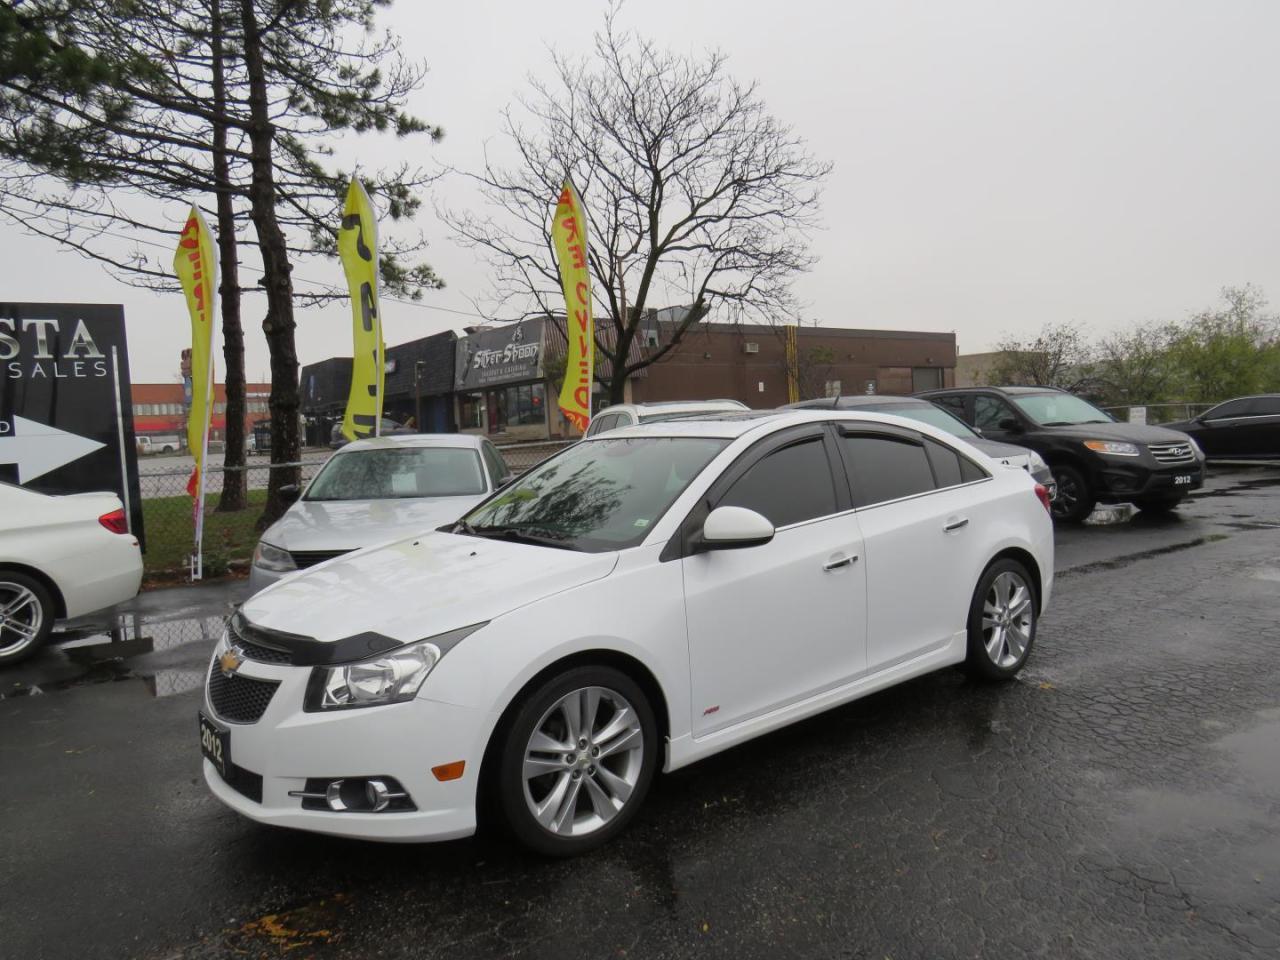 2012 Chevrolet Cruze LTZ (SOLD)